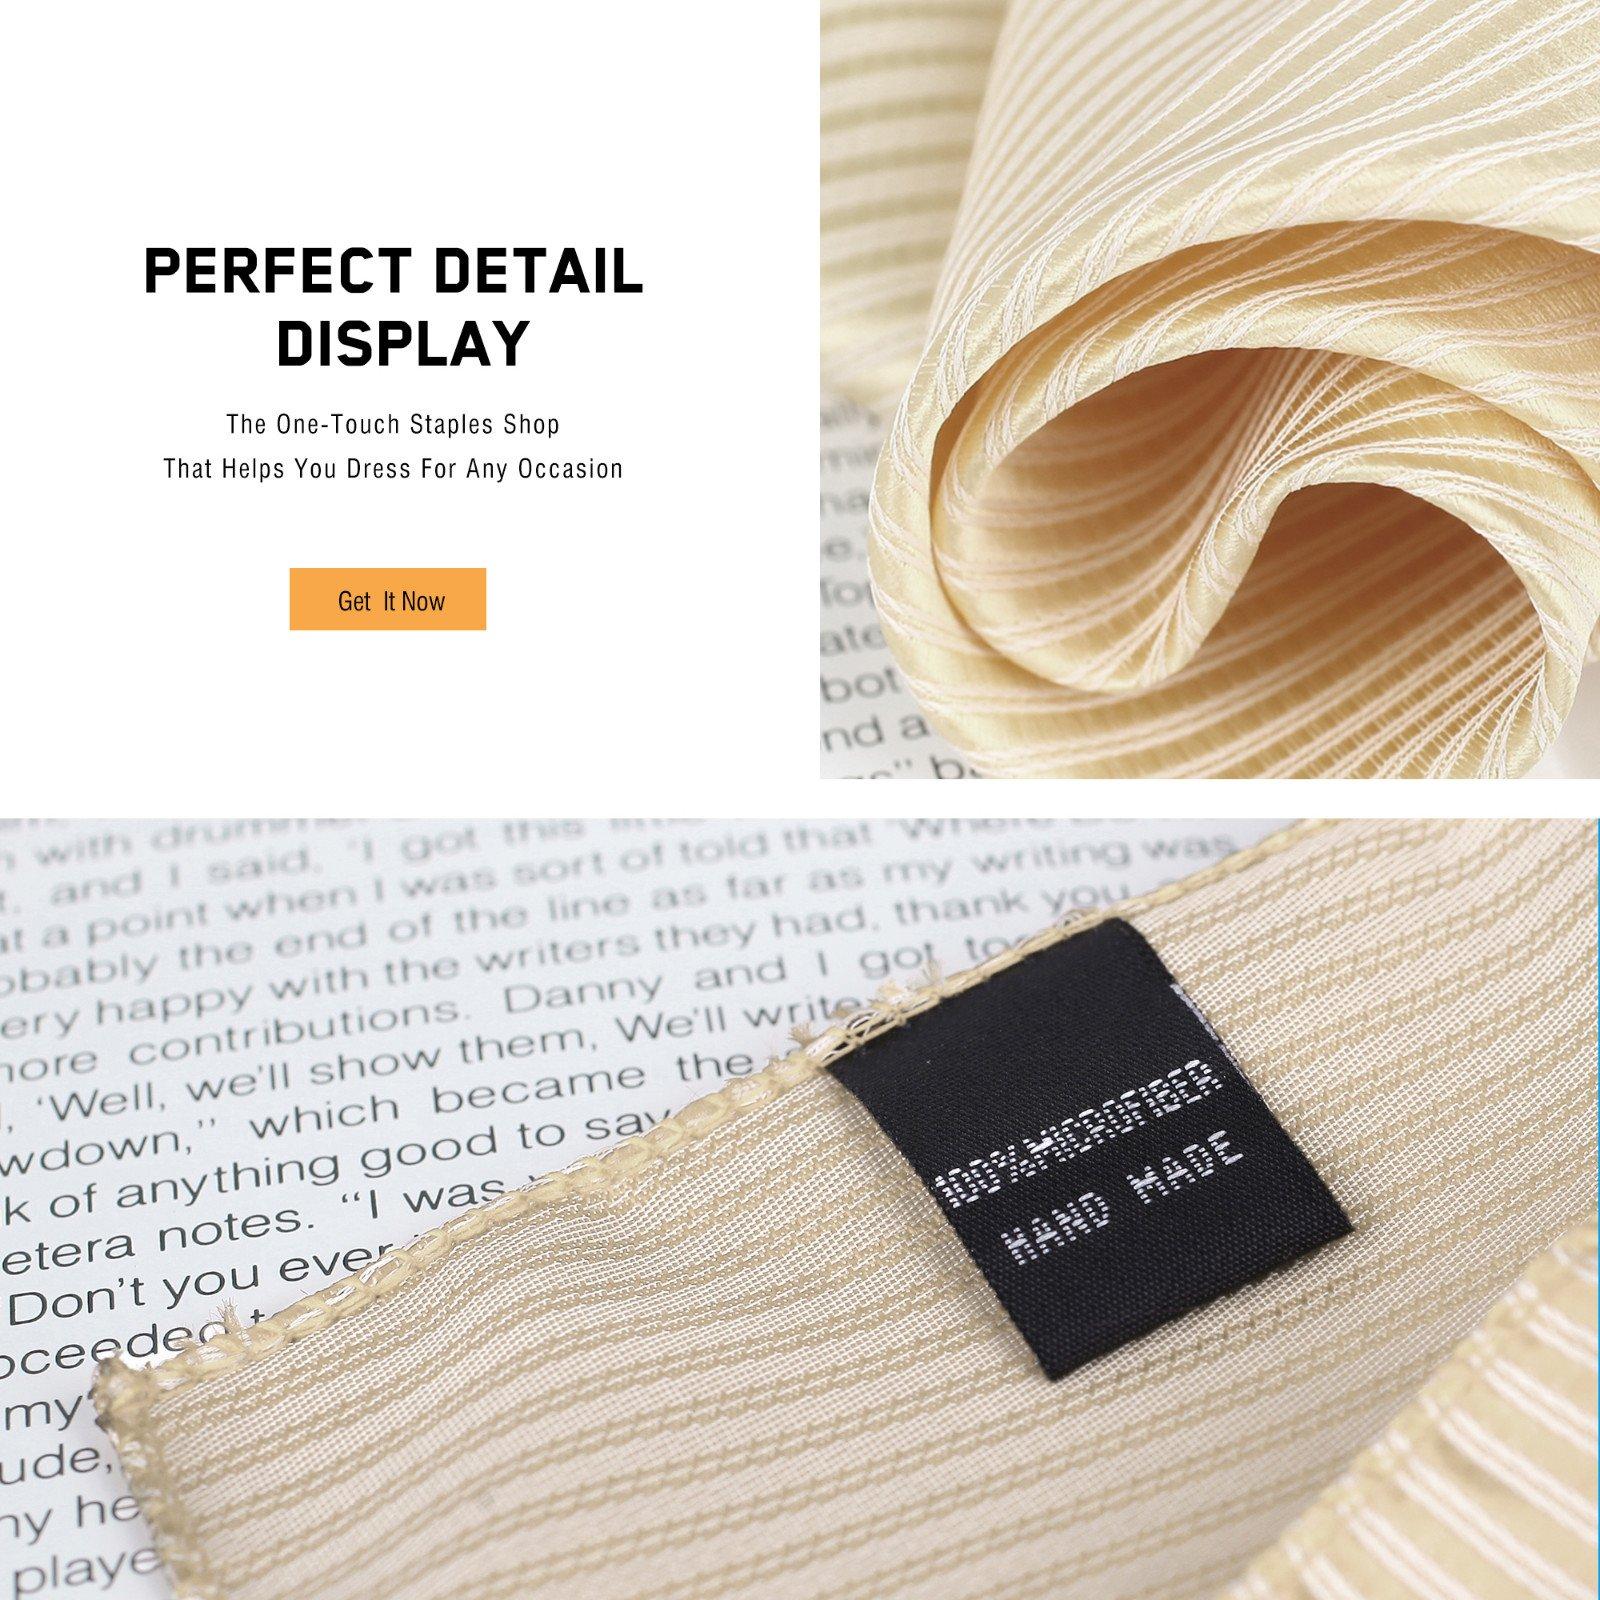 DEIA0004 Designer Stripes Microfiber Birthday Gifts for Mens Hanky Set 5 Hankerchiefs Set-Pink, Dark Orange, Grey, Beige, White By Dan Smith by Dan Smith (Image #6)